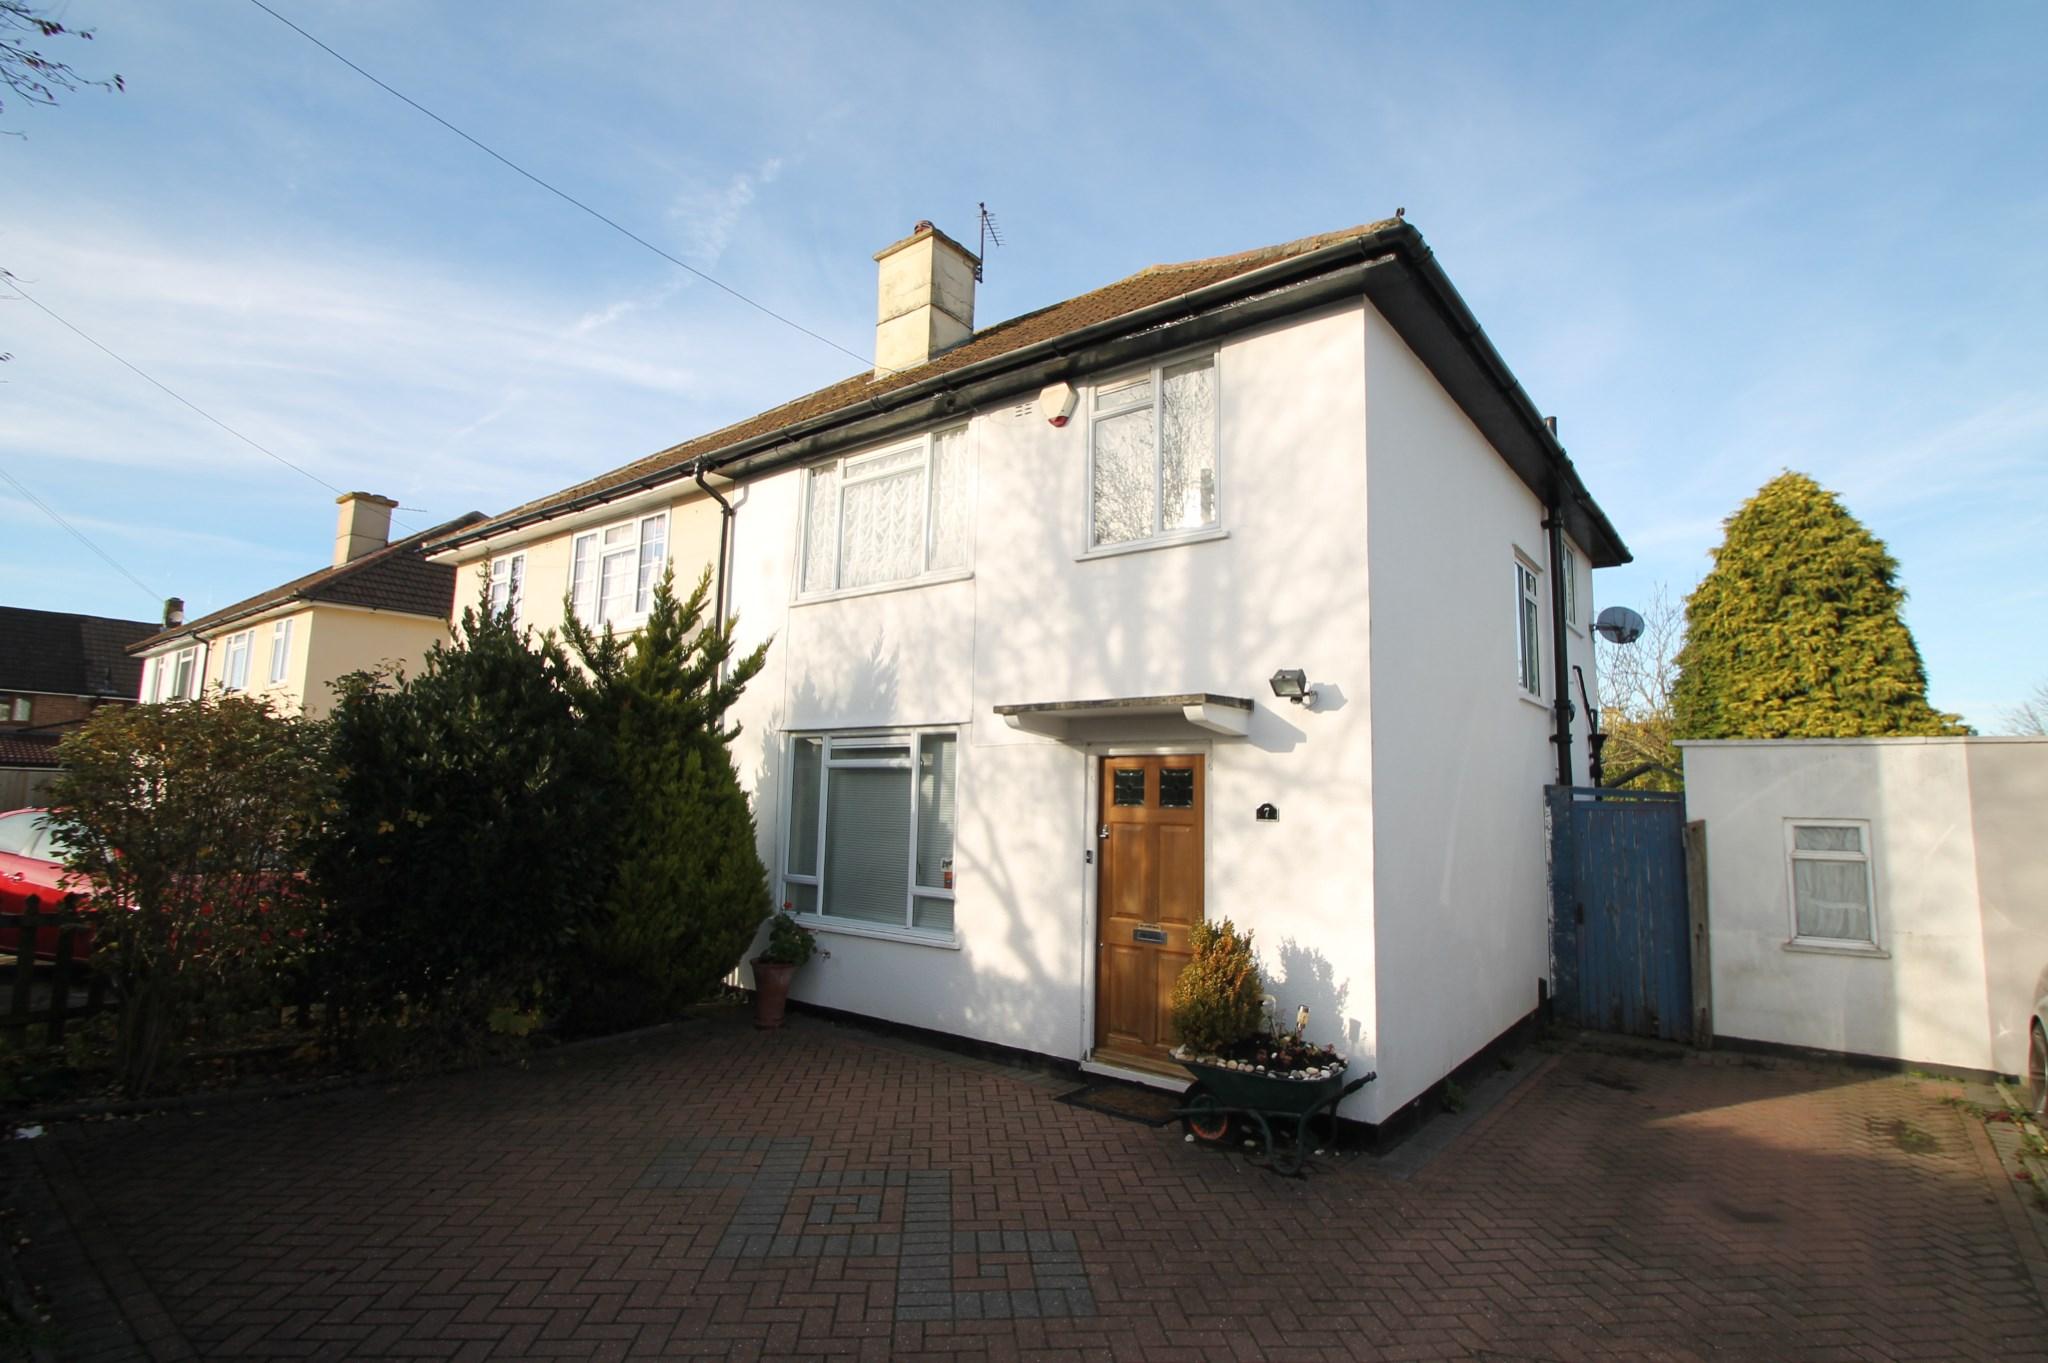 Cator Close, New Addington, Croydon, CR0